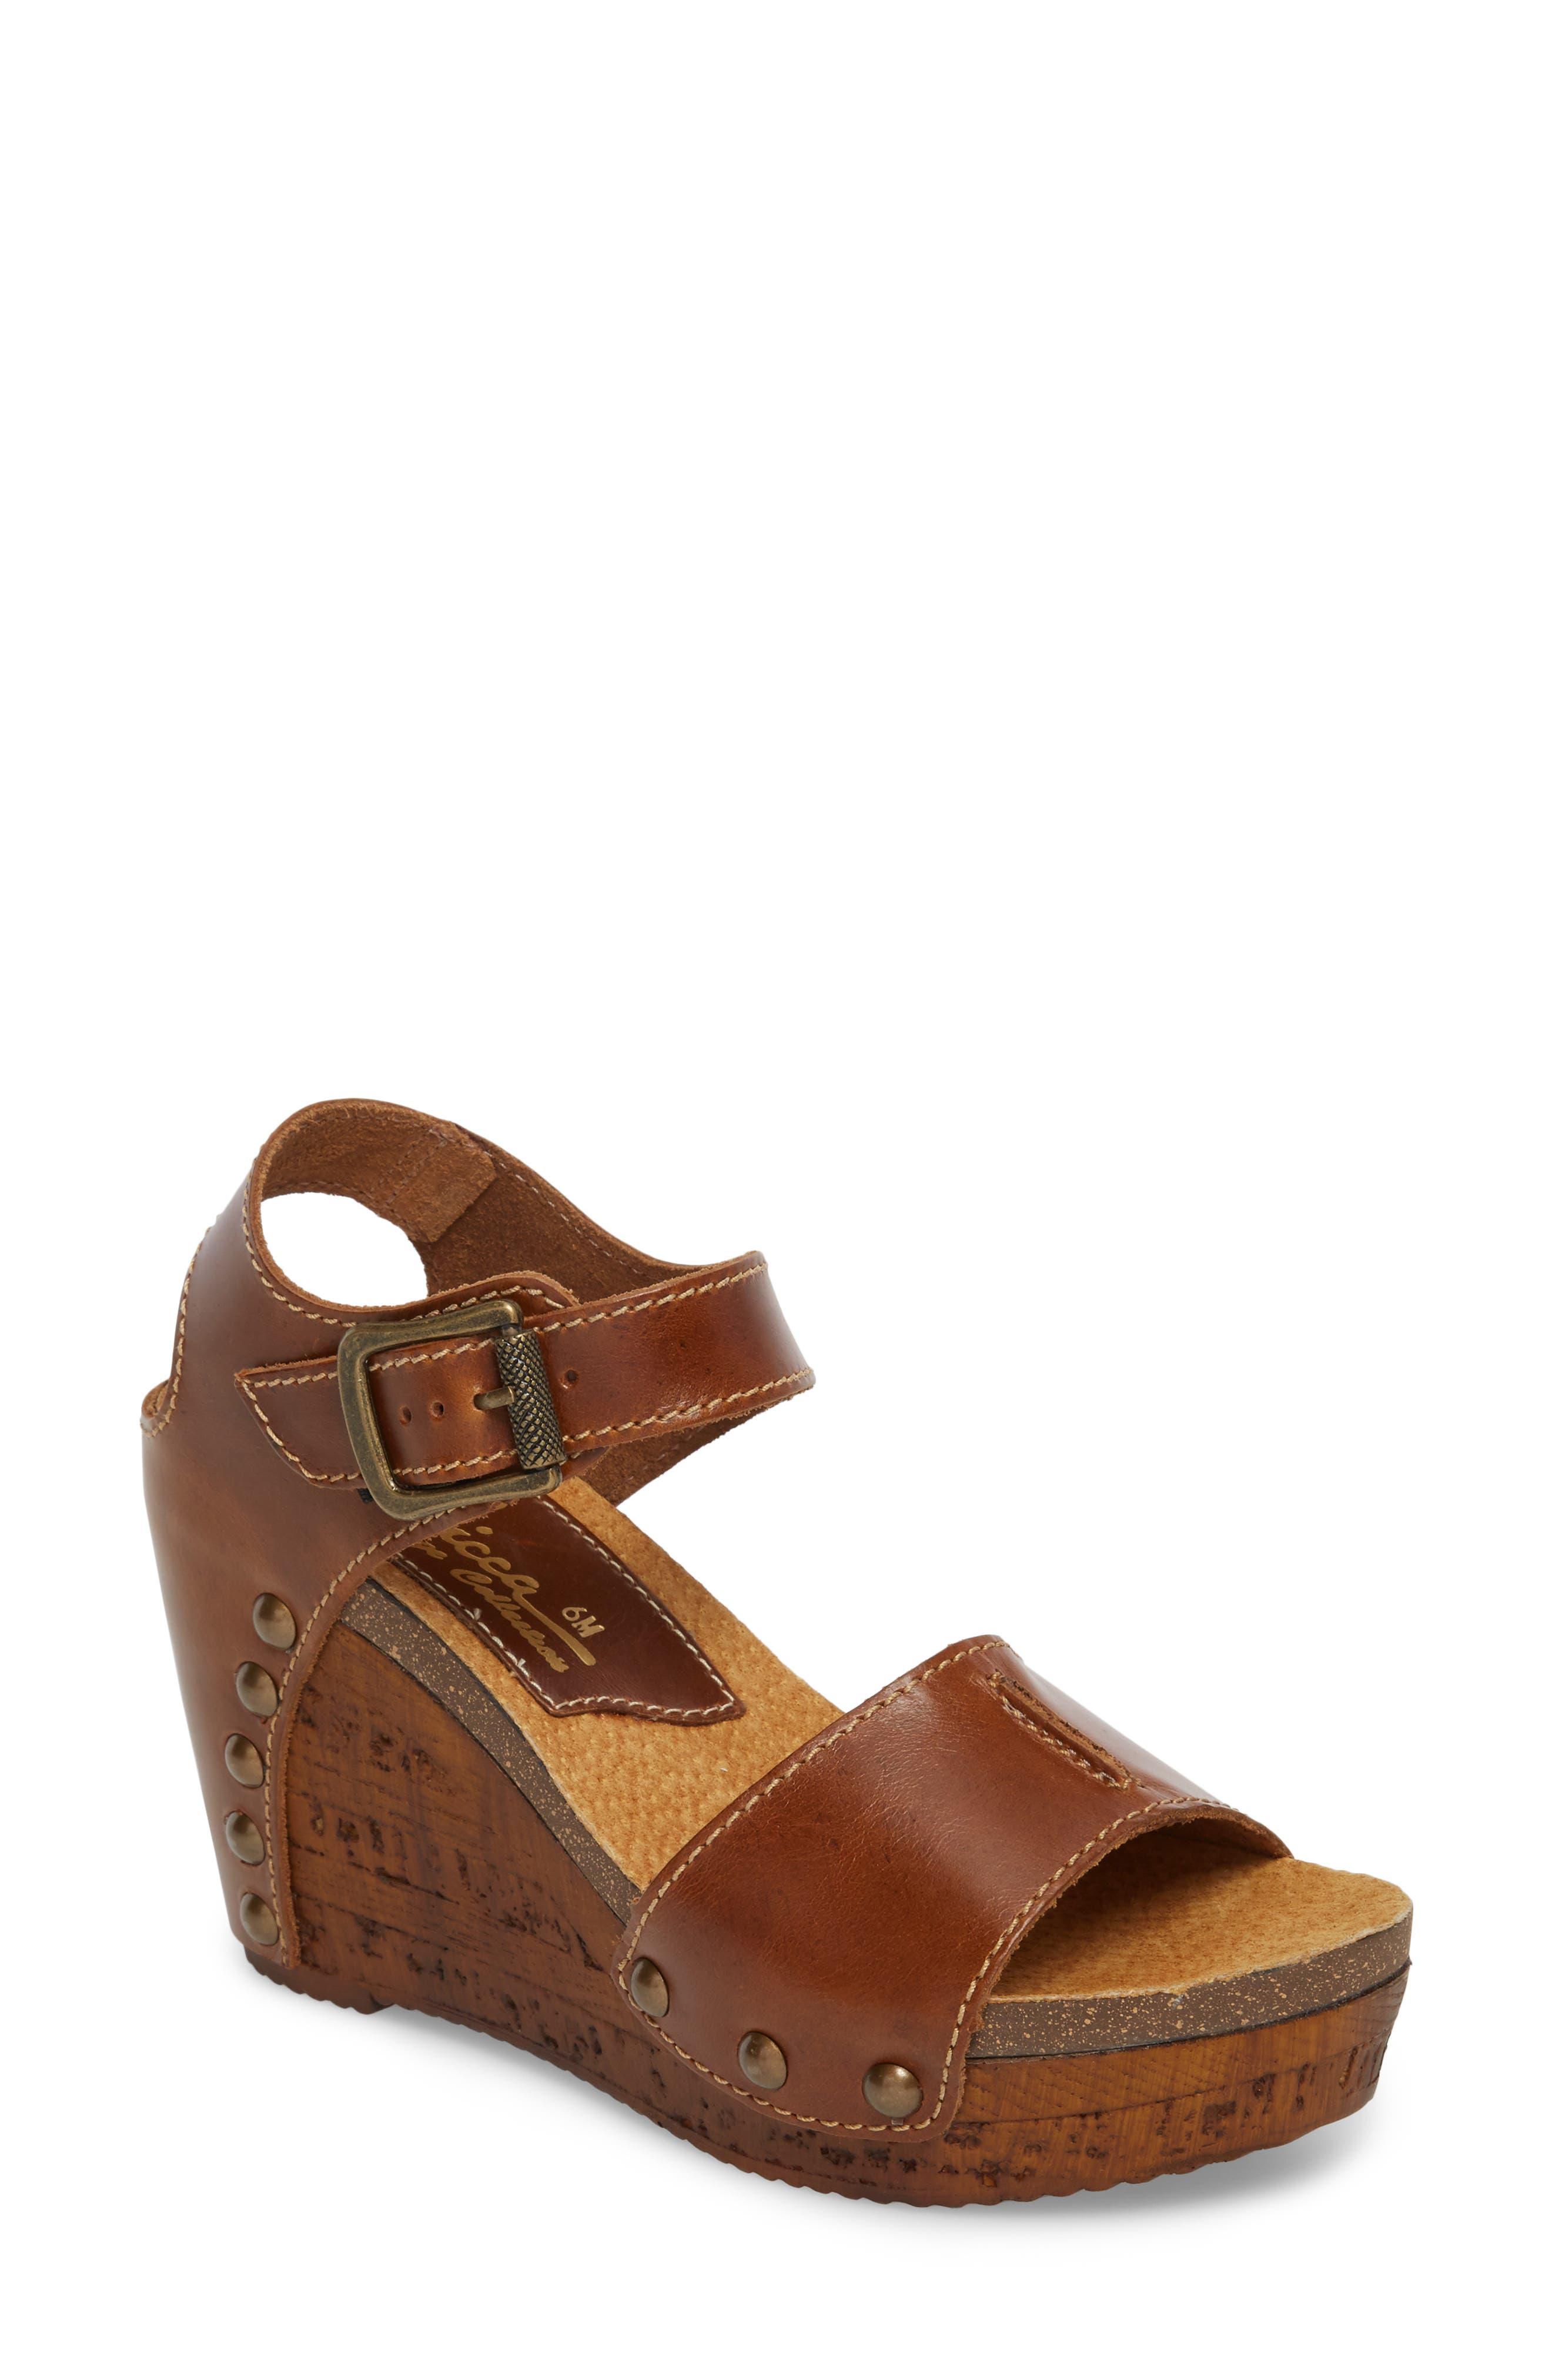 Main Image - Sbicca Brella Studded Platform Wedge Sandal (Women)